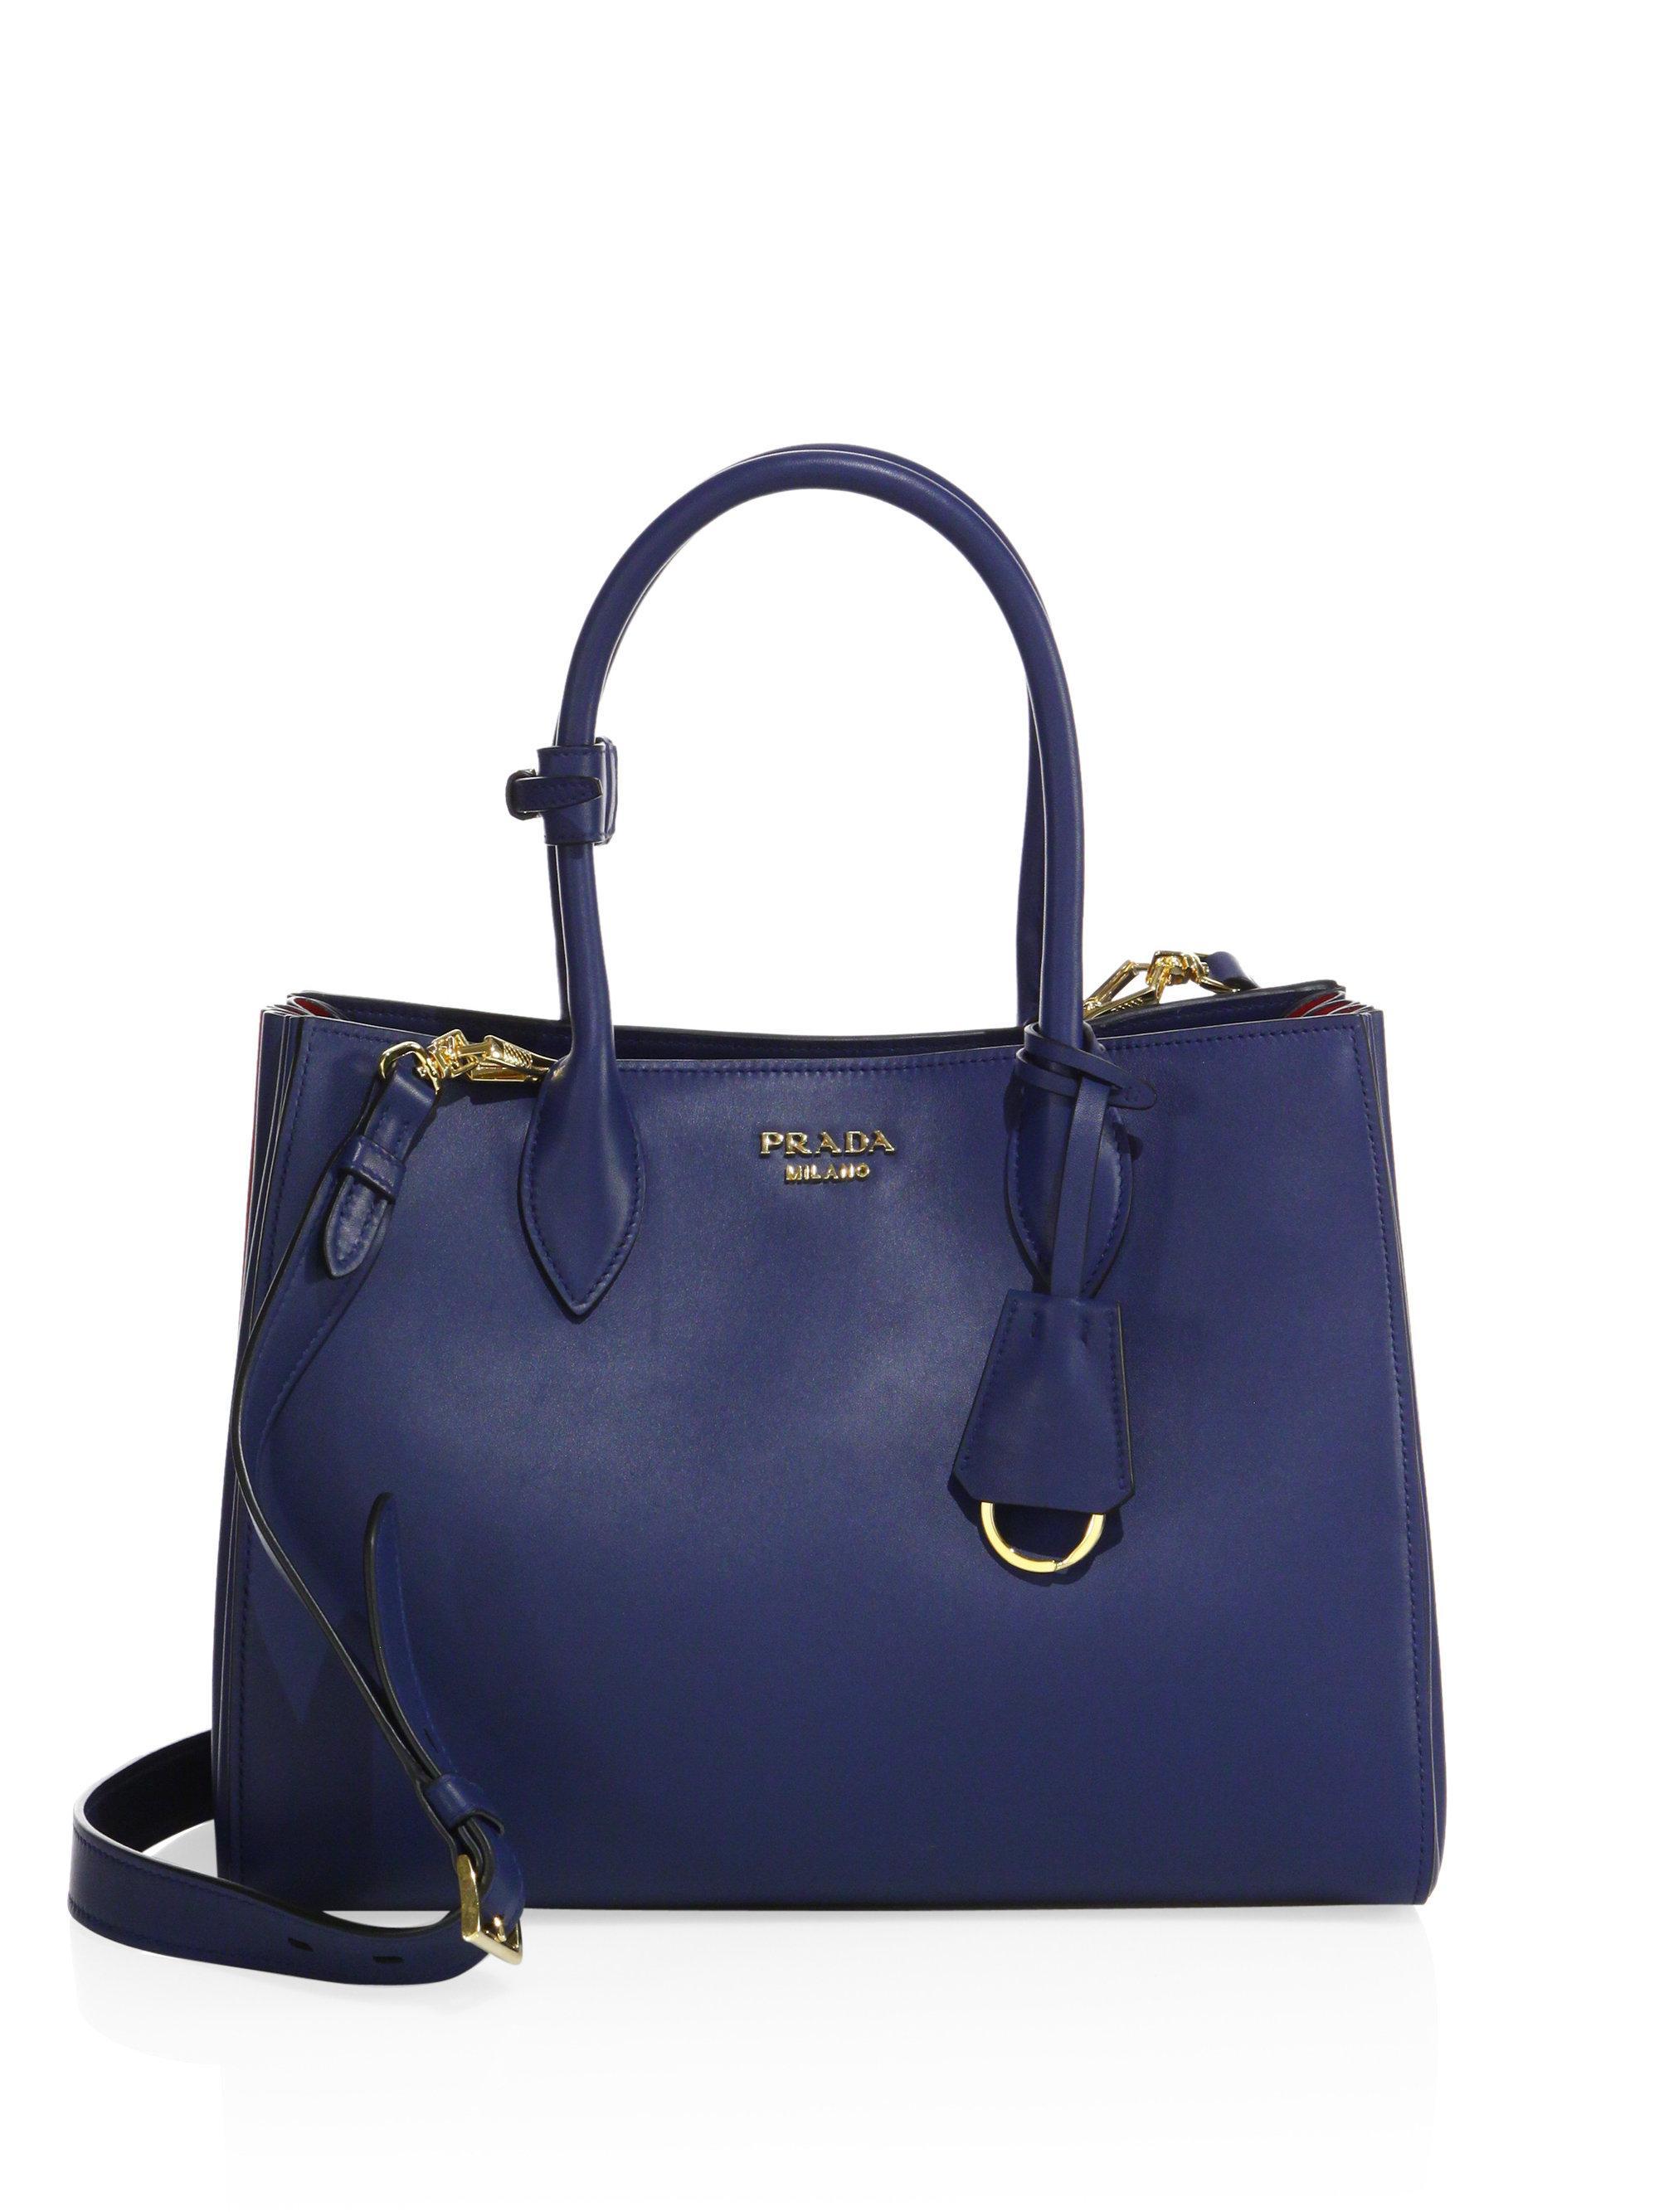 178a31be0c5f ... shop lyst prada city two tone leather tote in blue 45142 3e6e4